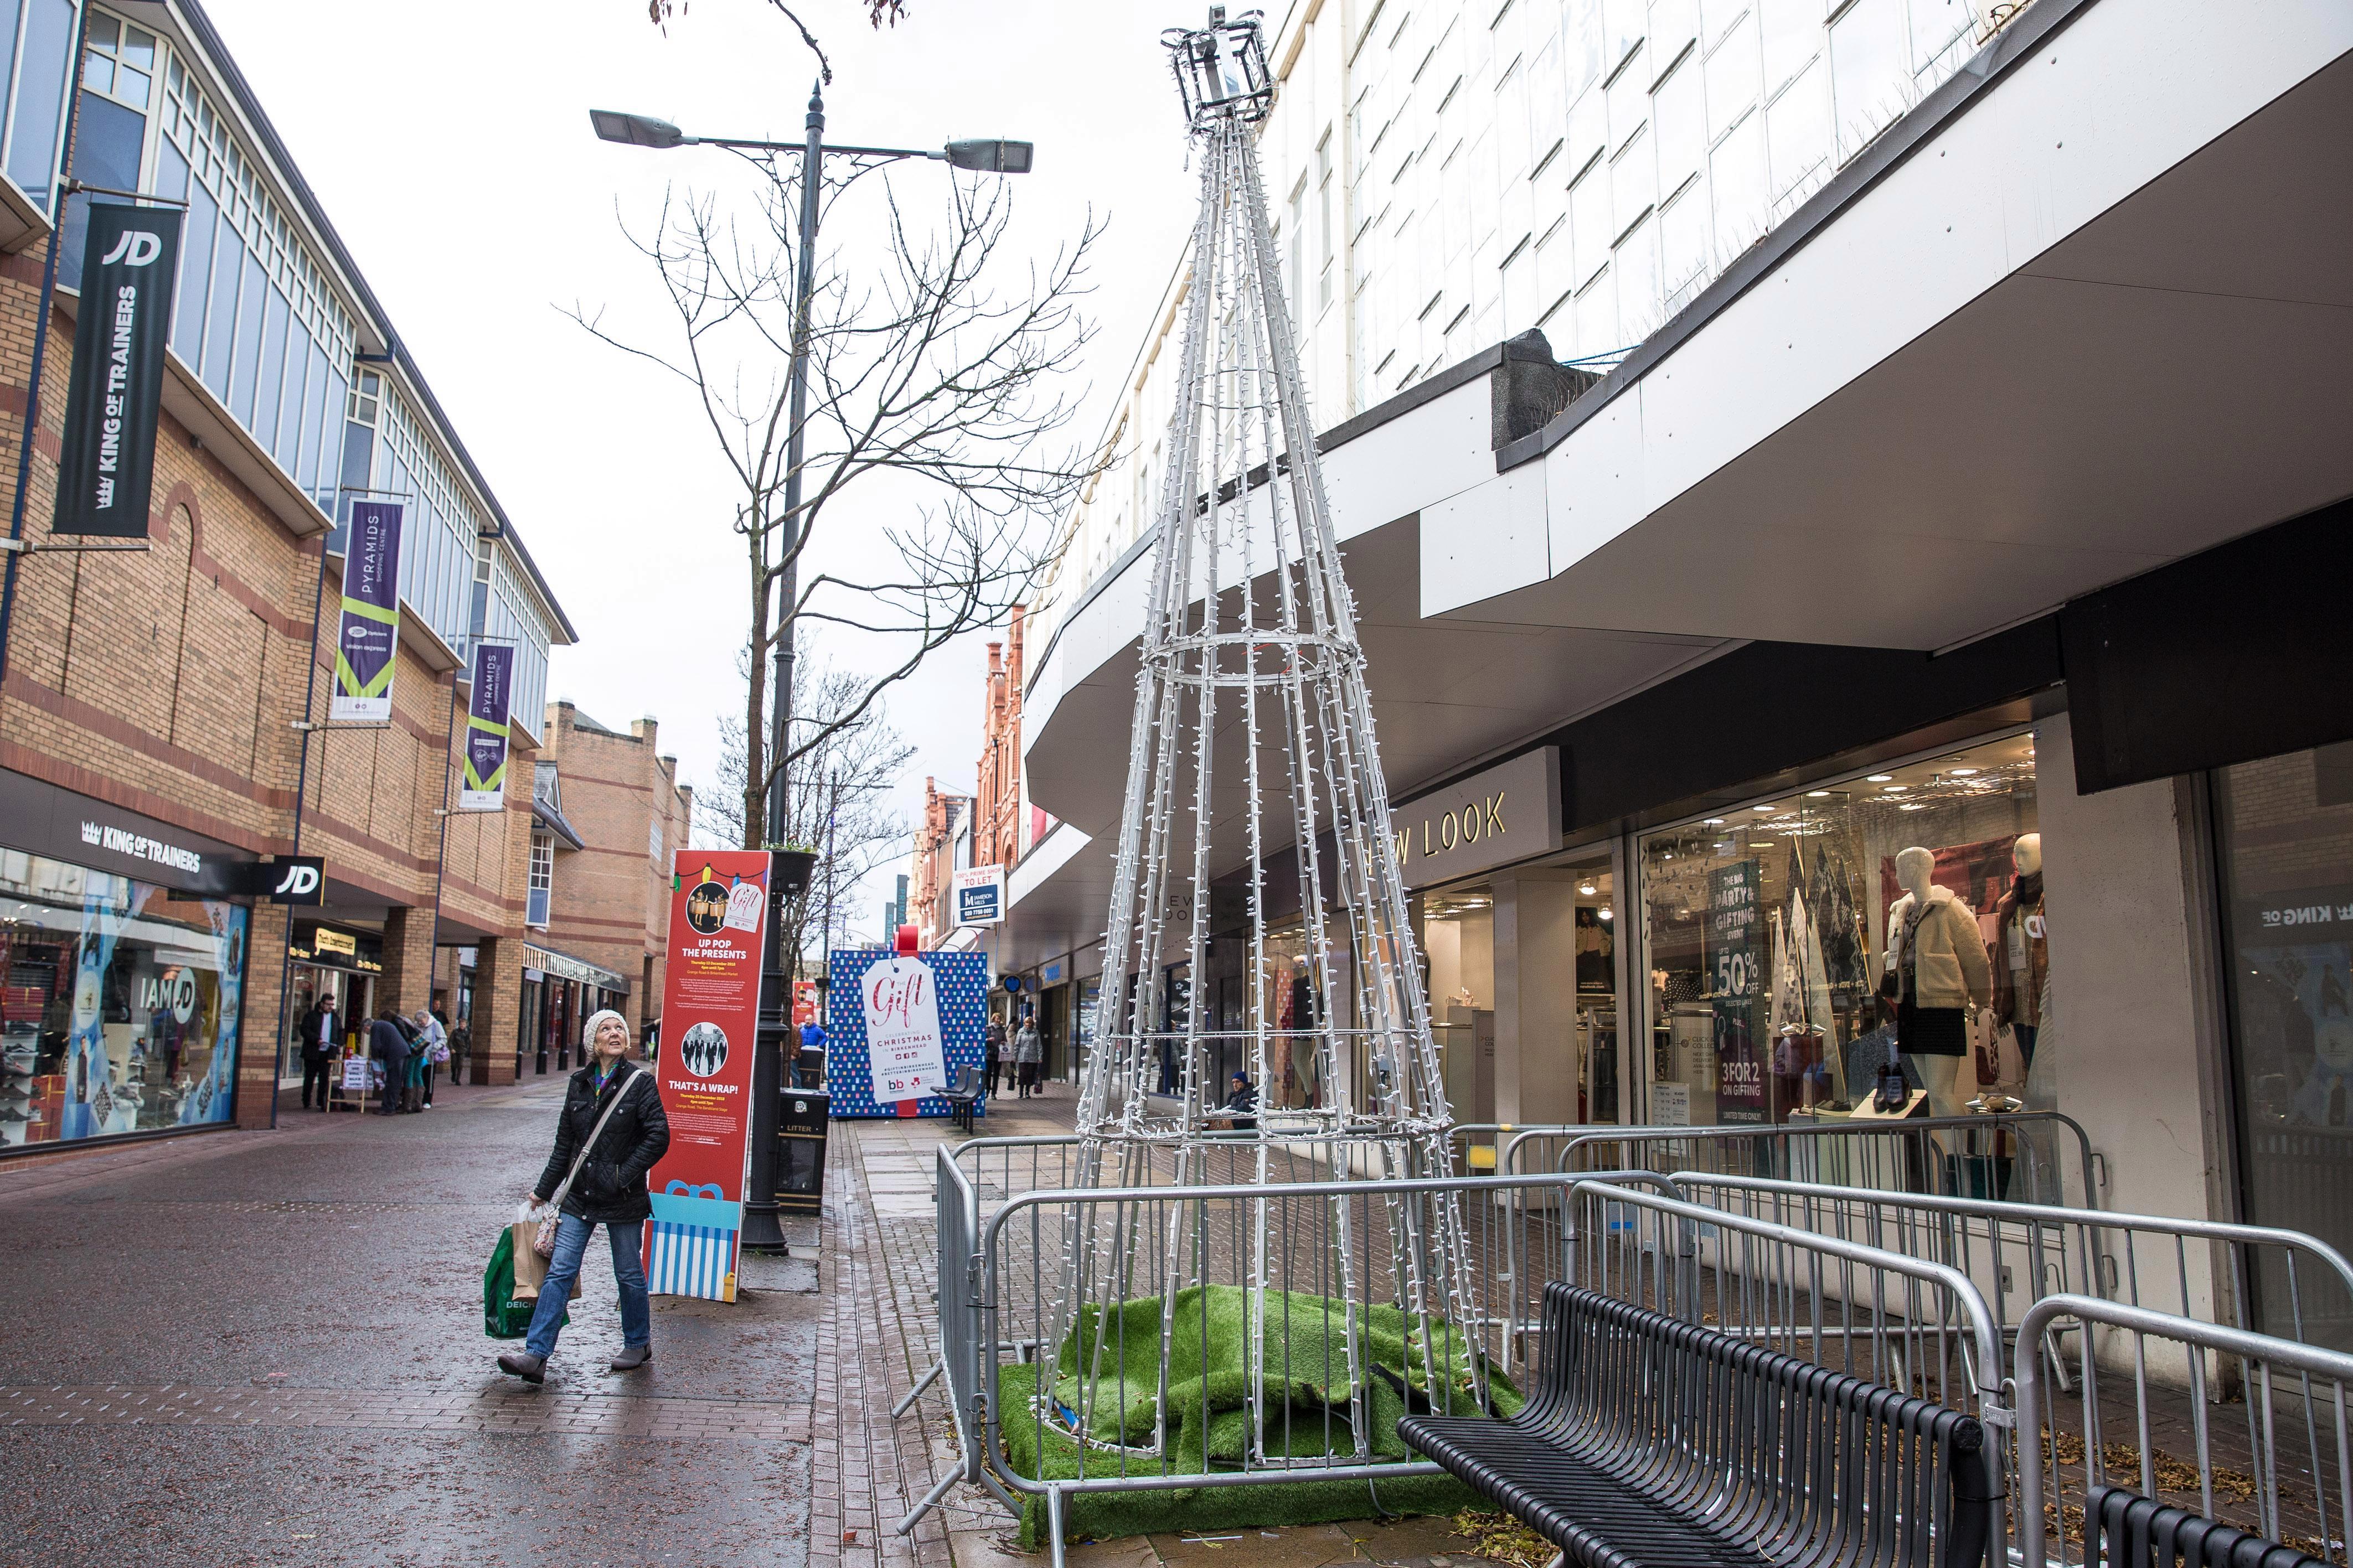 Shoppers mock town's 'appalling' Christmas tree saying it 'looks like scaffolding'